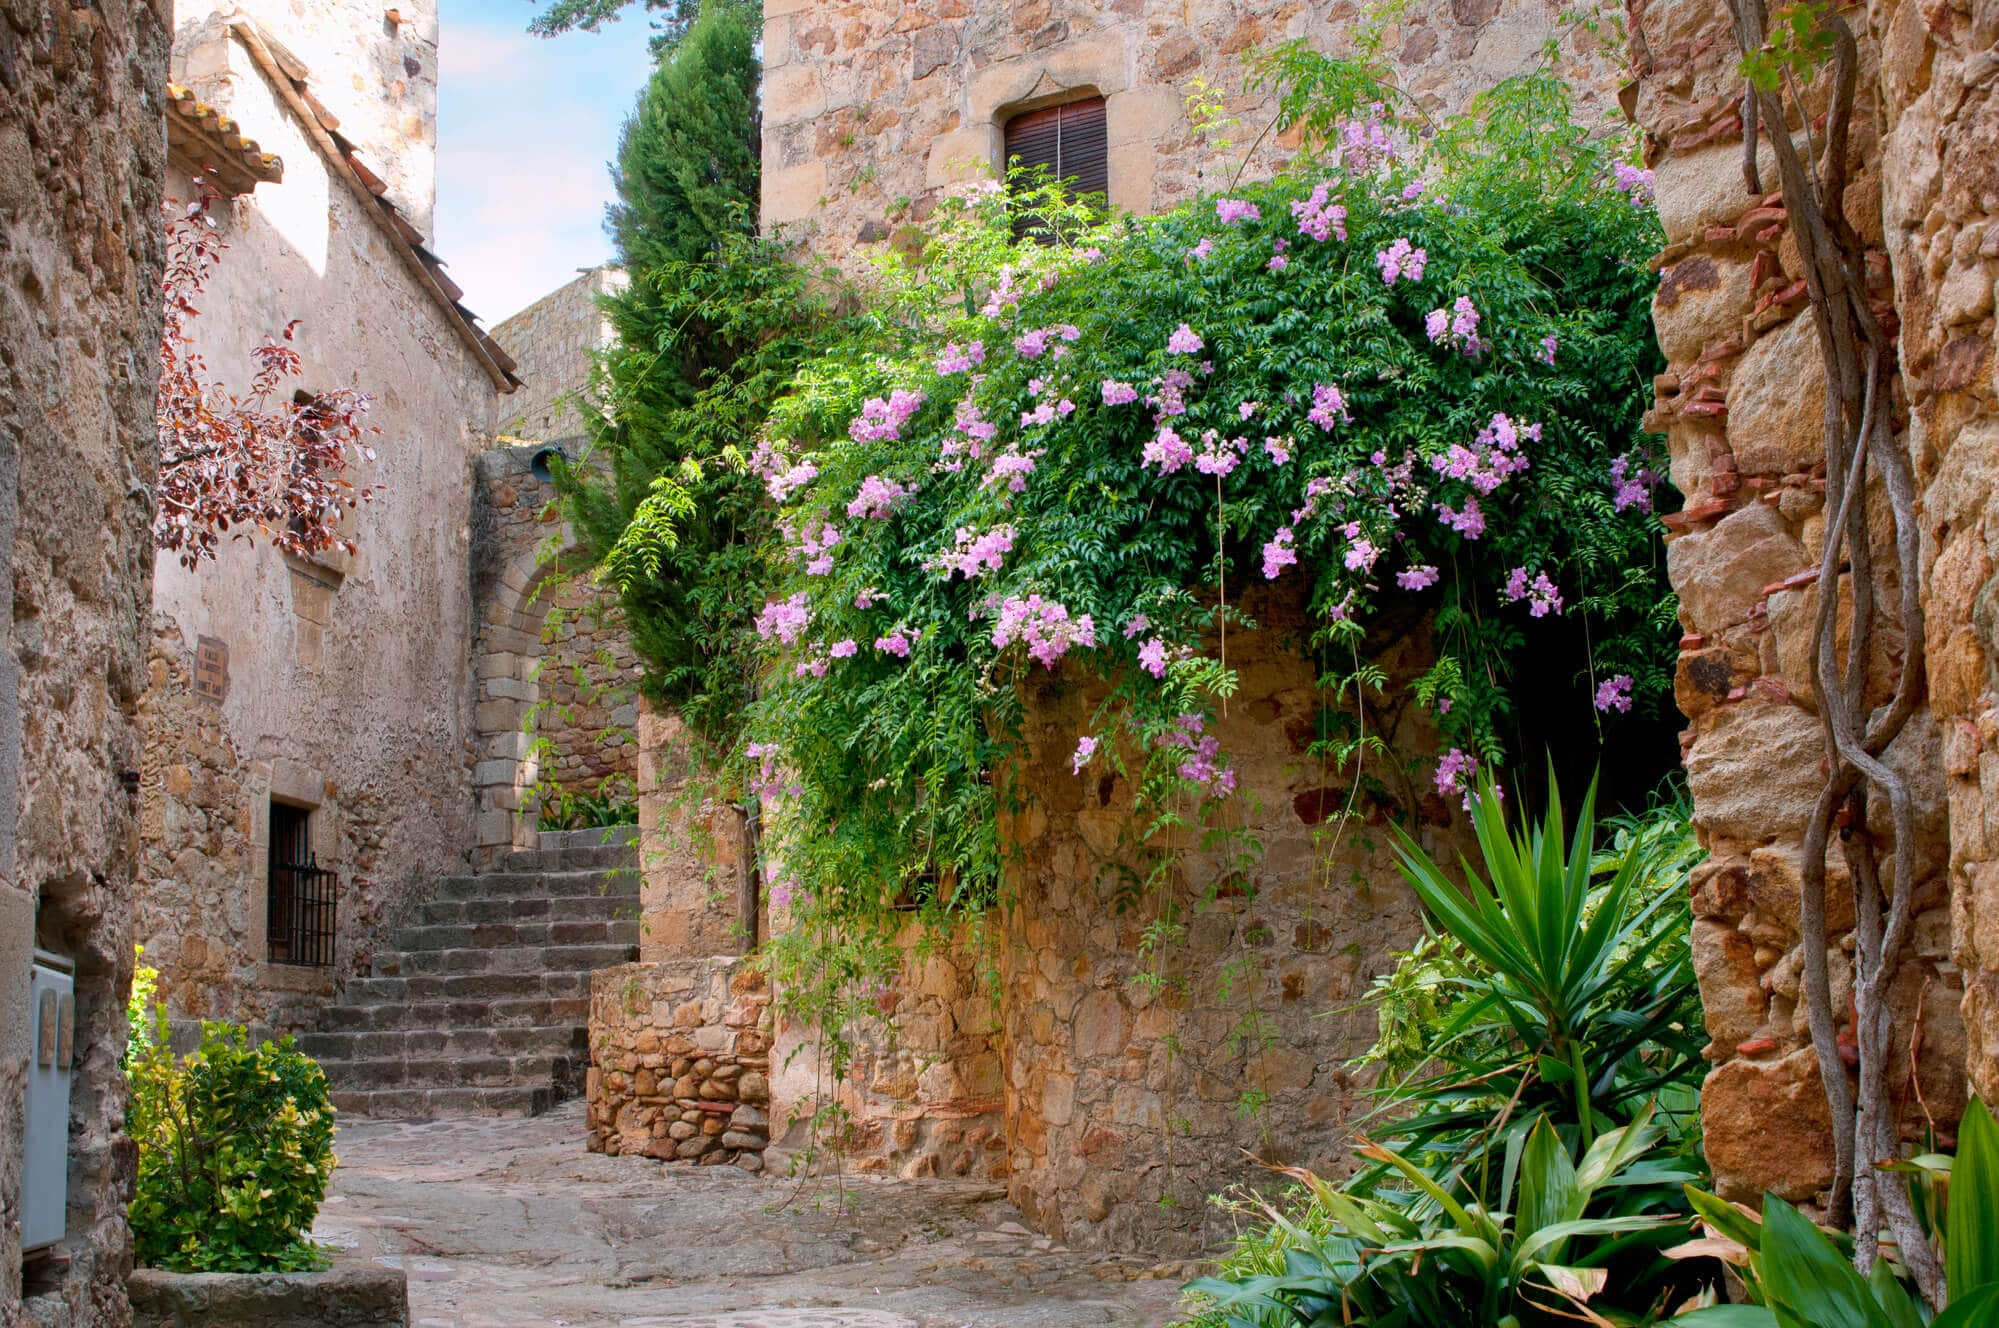 Peratallada - A hidden gem in Spain